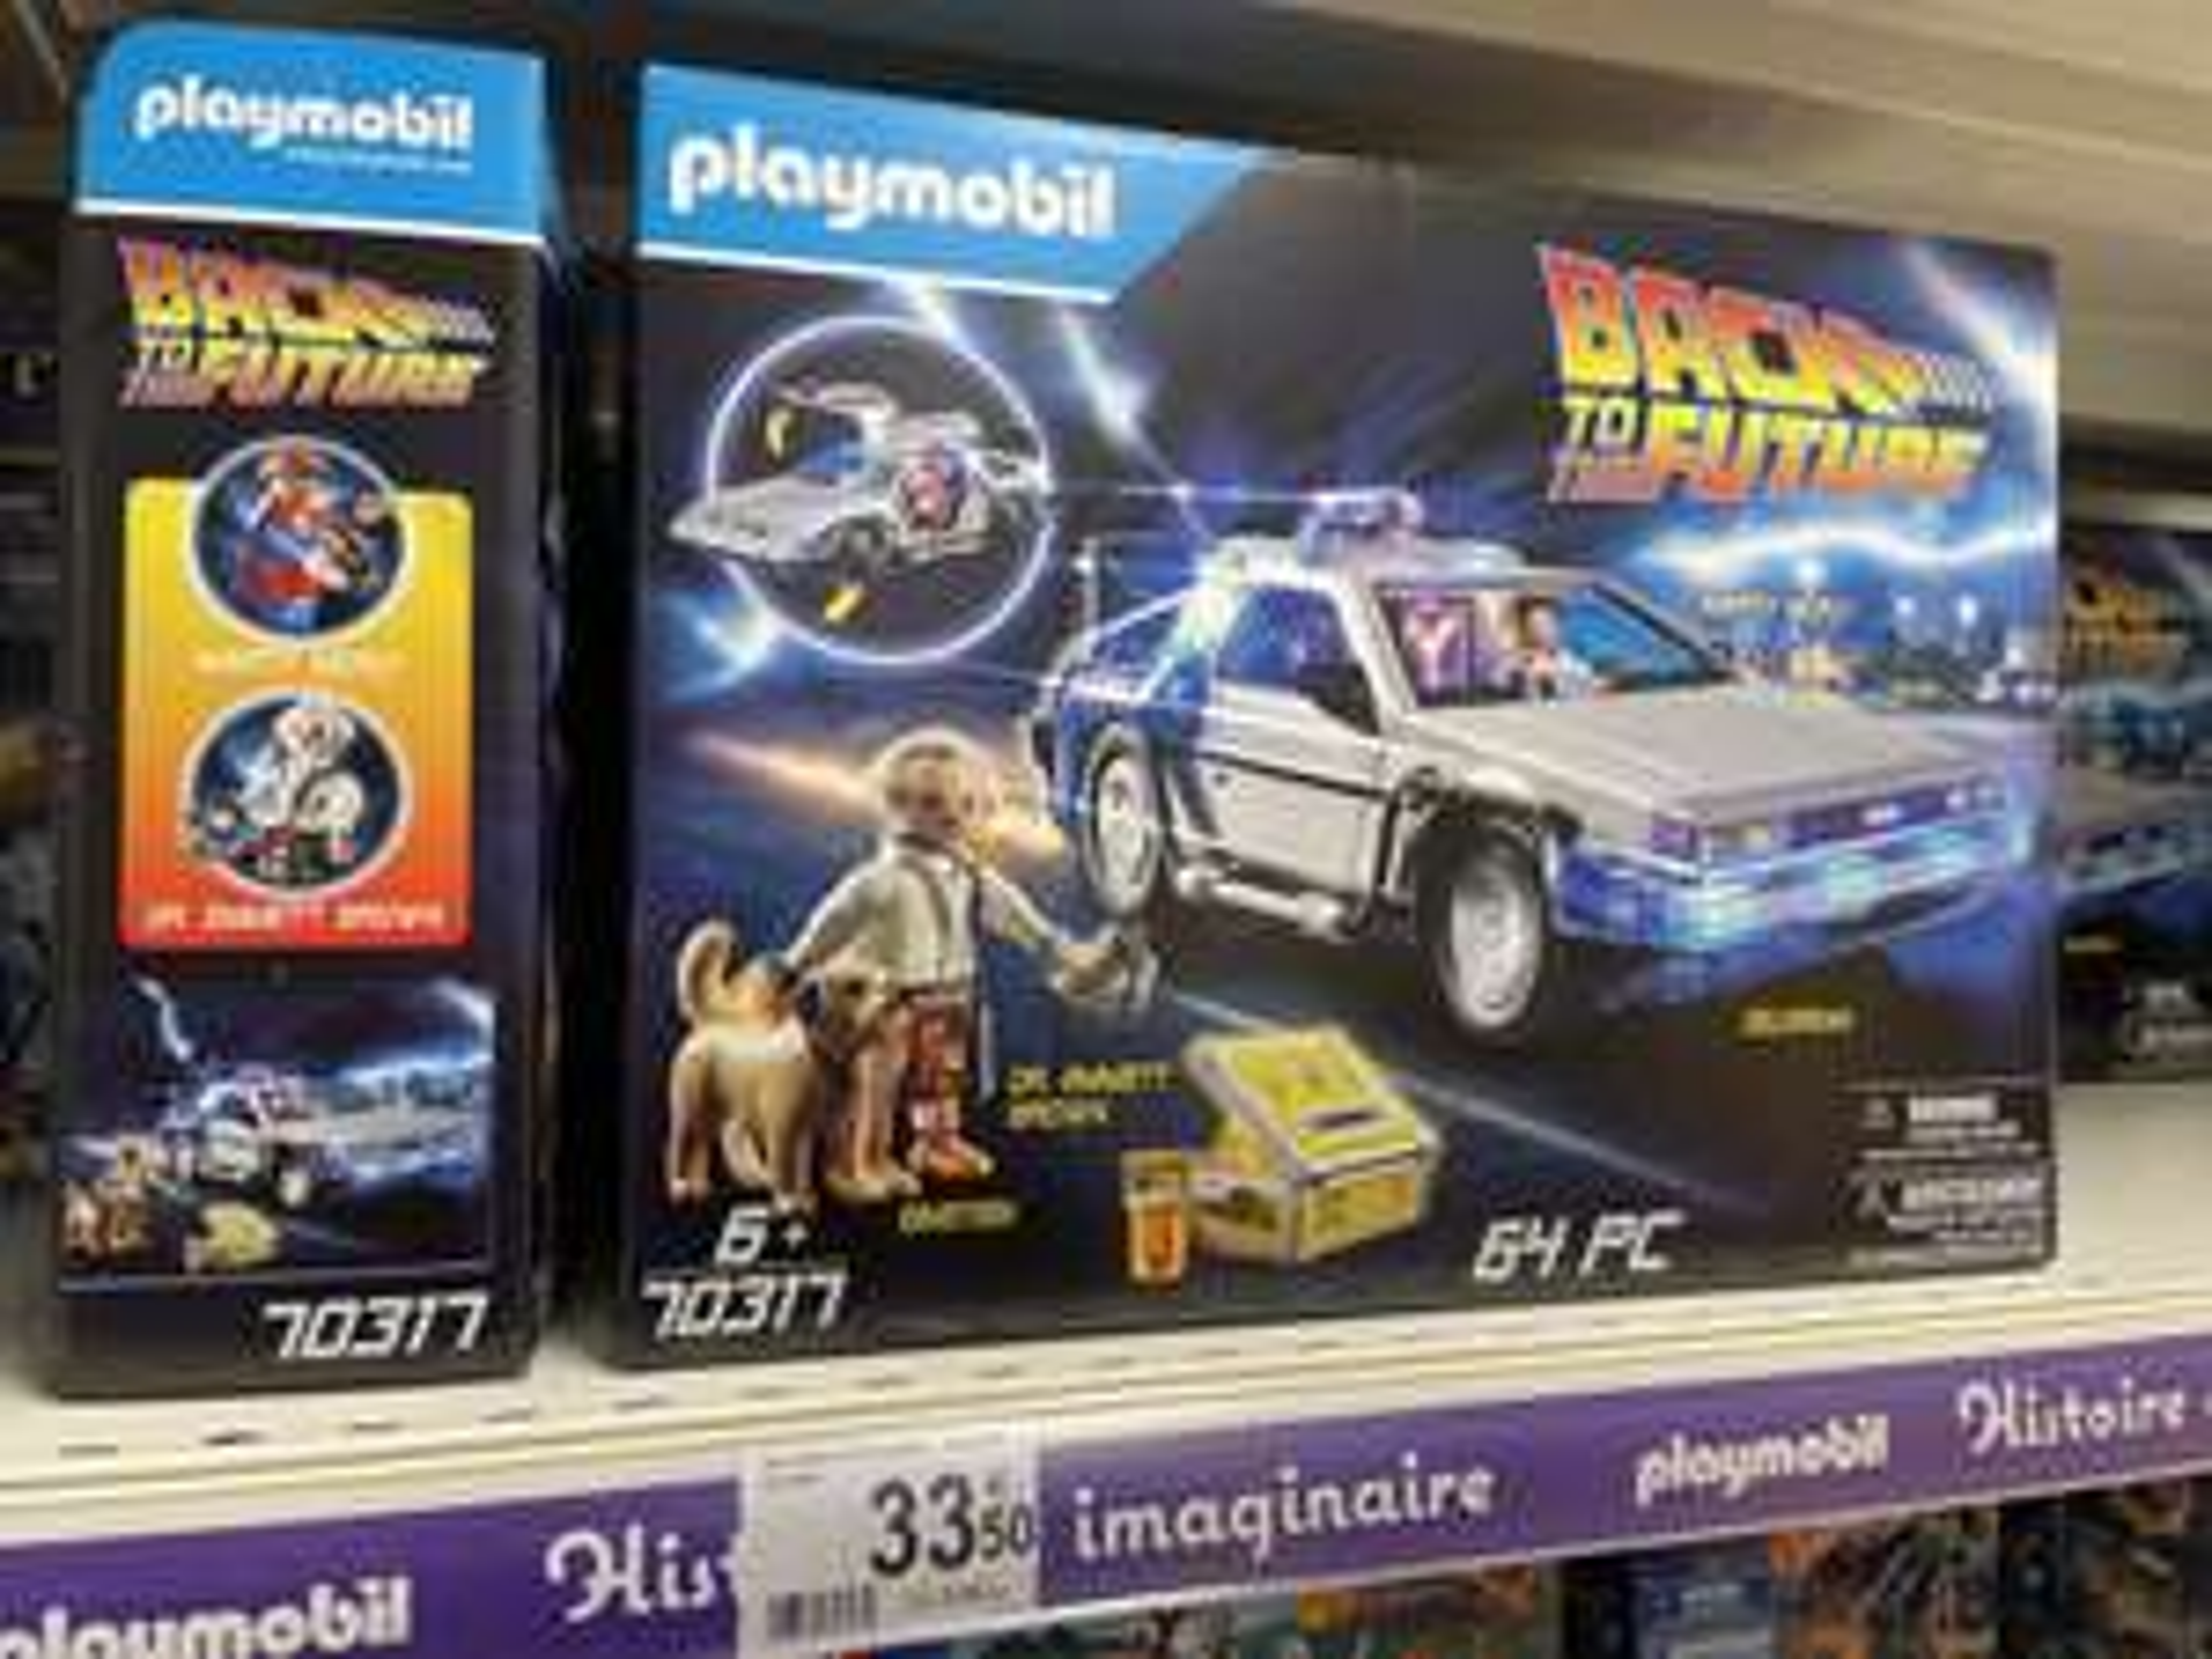 Jouet Playmobil Back To The Future Delorean 70317 - Vélizy 2 (78)